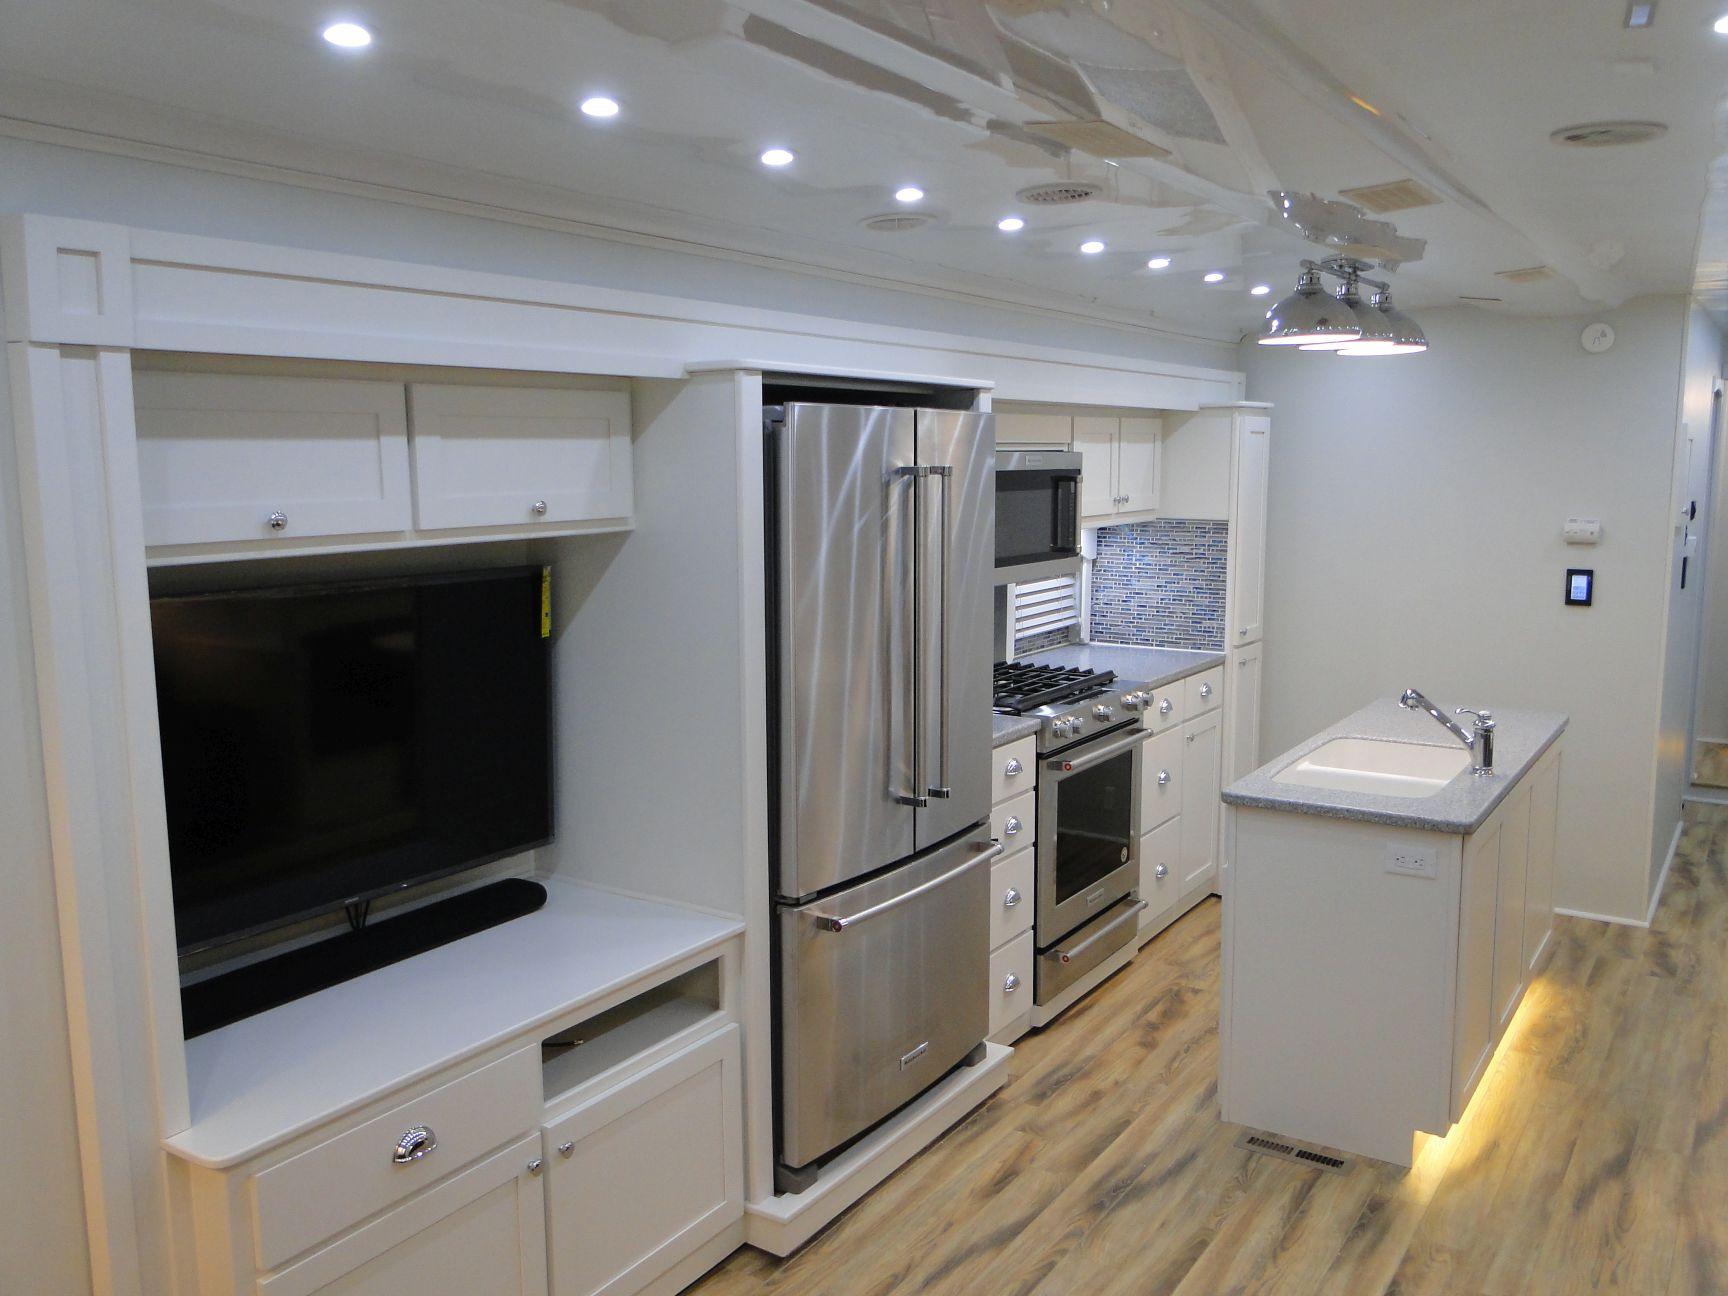 Entertainment Center/Residential Kitchen